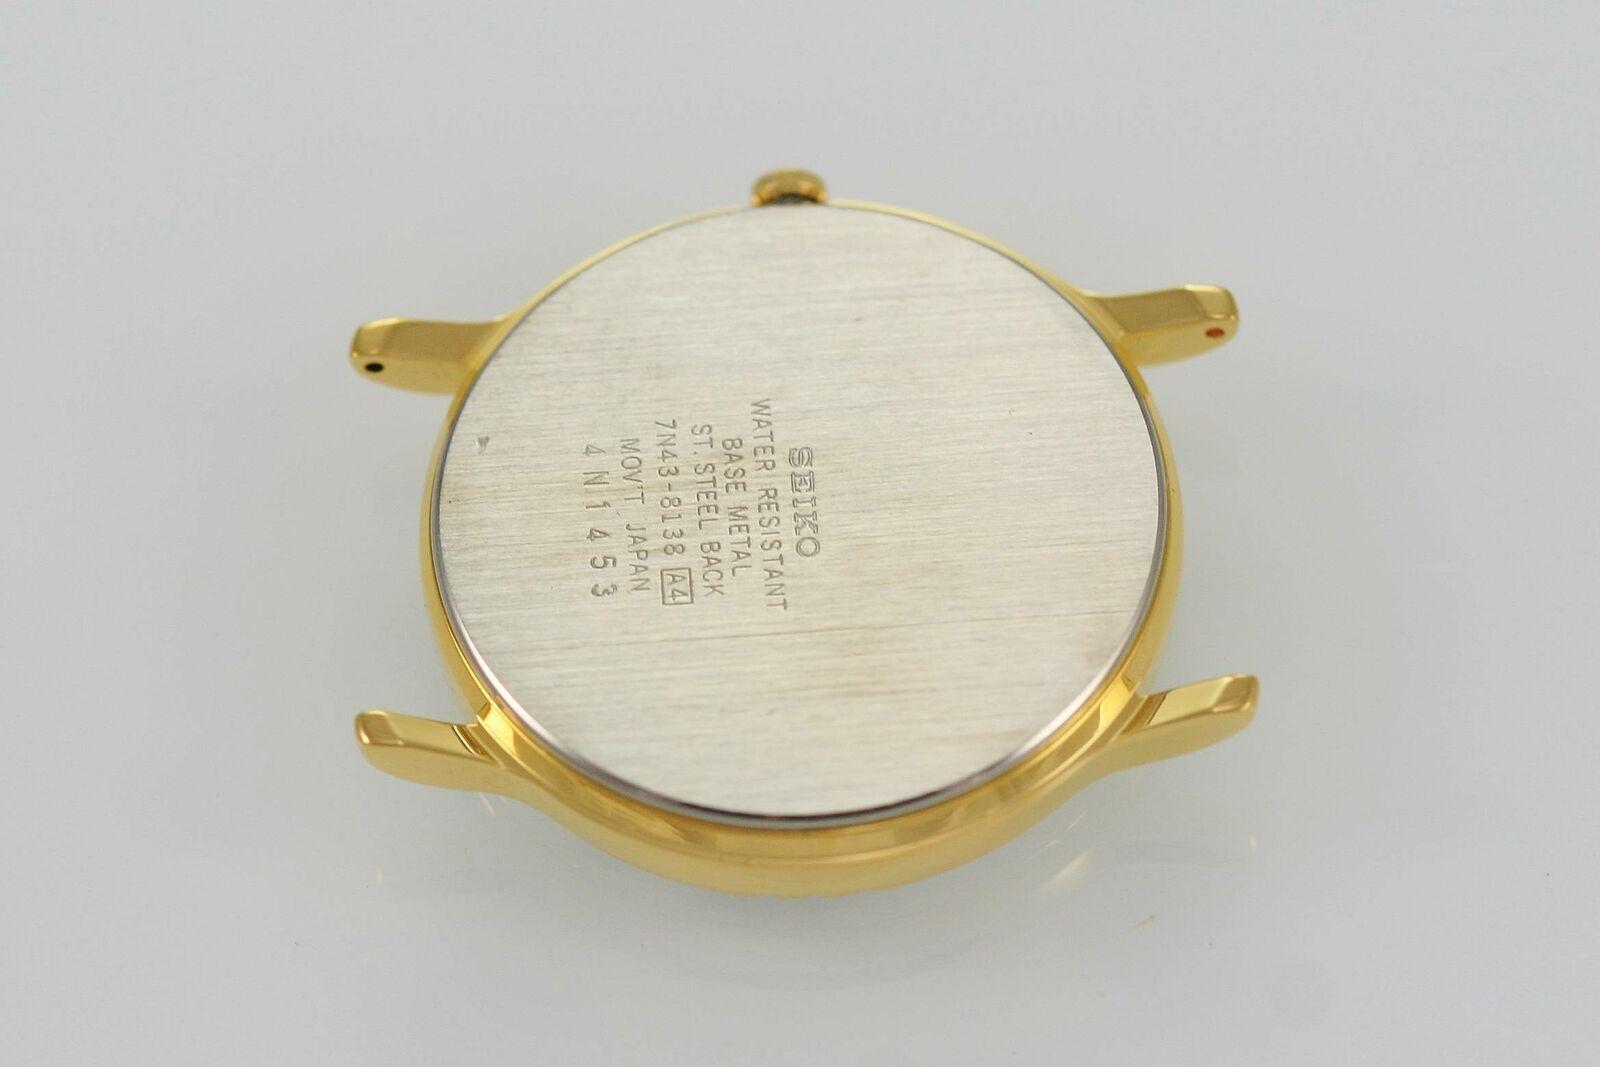 Brand New Seiko Men?s Quartz Gold Watch Case Stainless 7N43 MVT